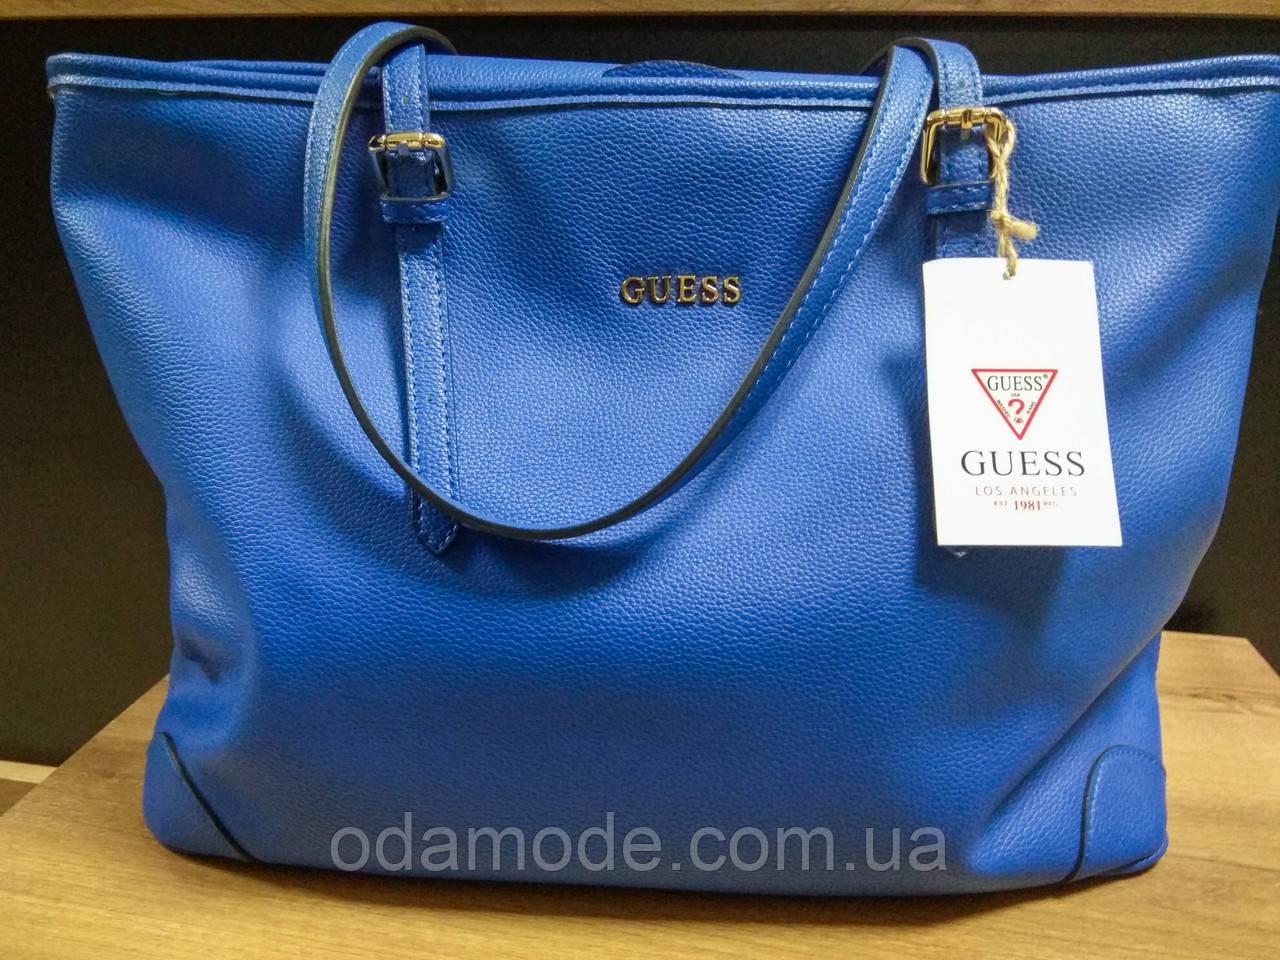 Cумка женская синяя Guess